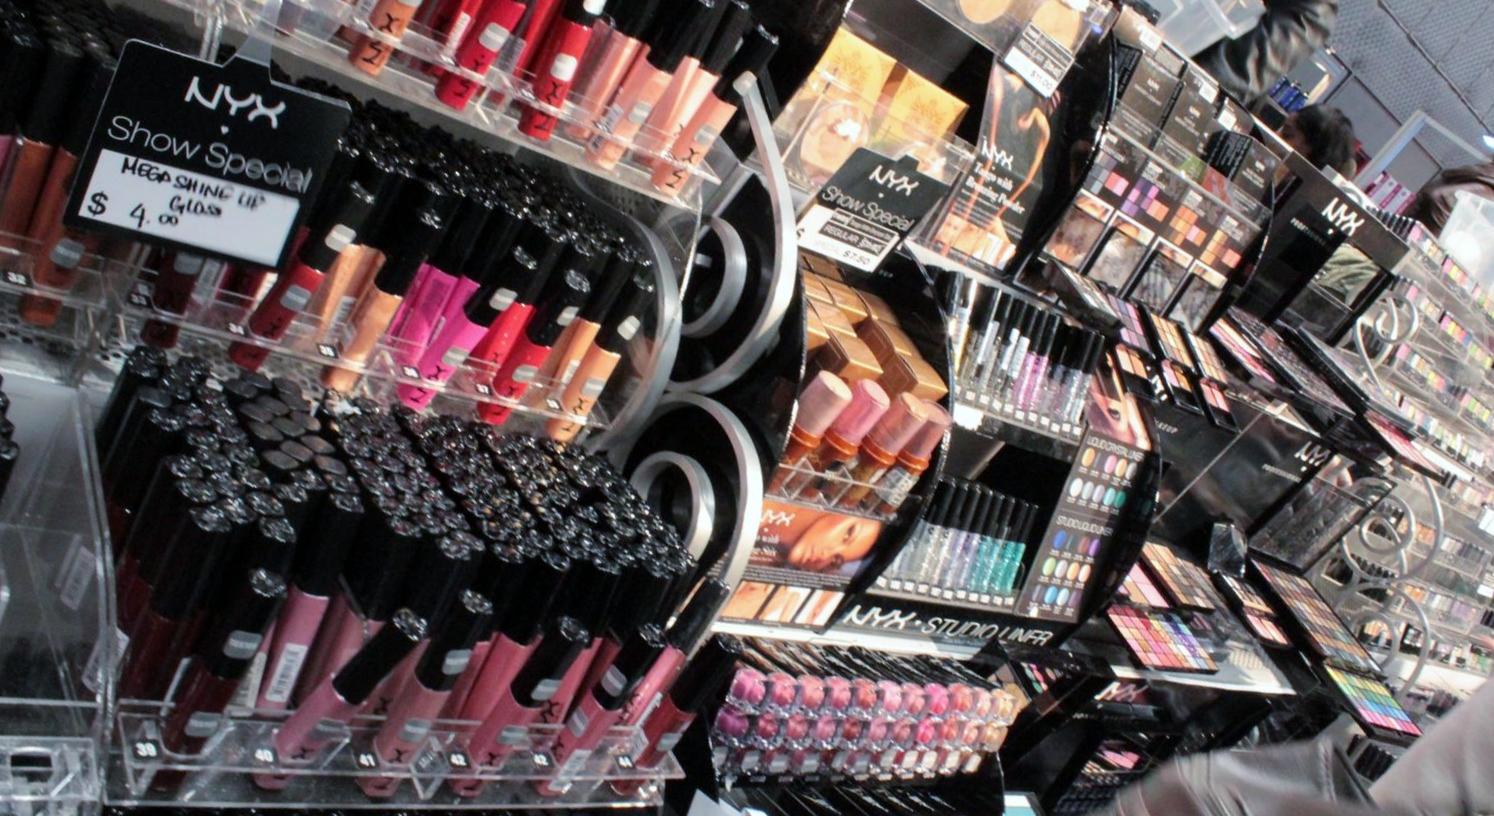 nyx cosmetics uk blog post